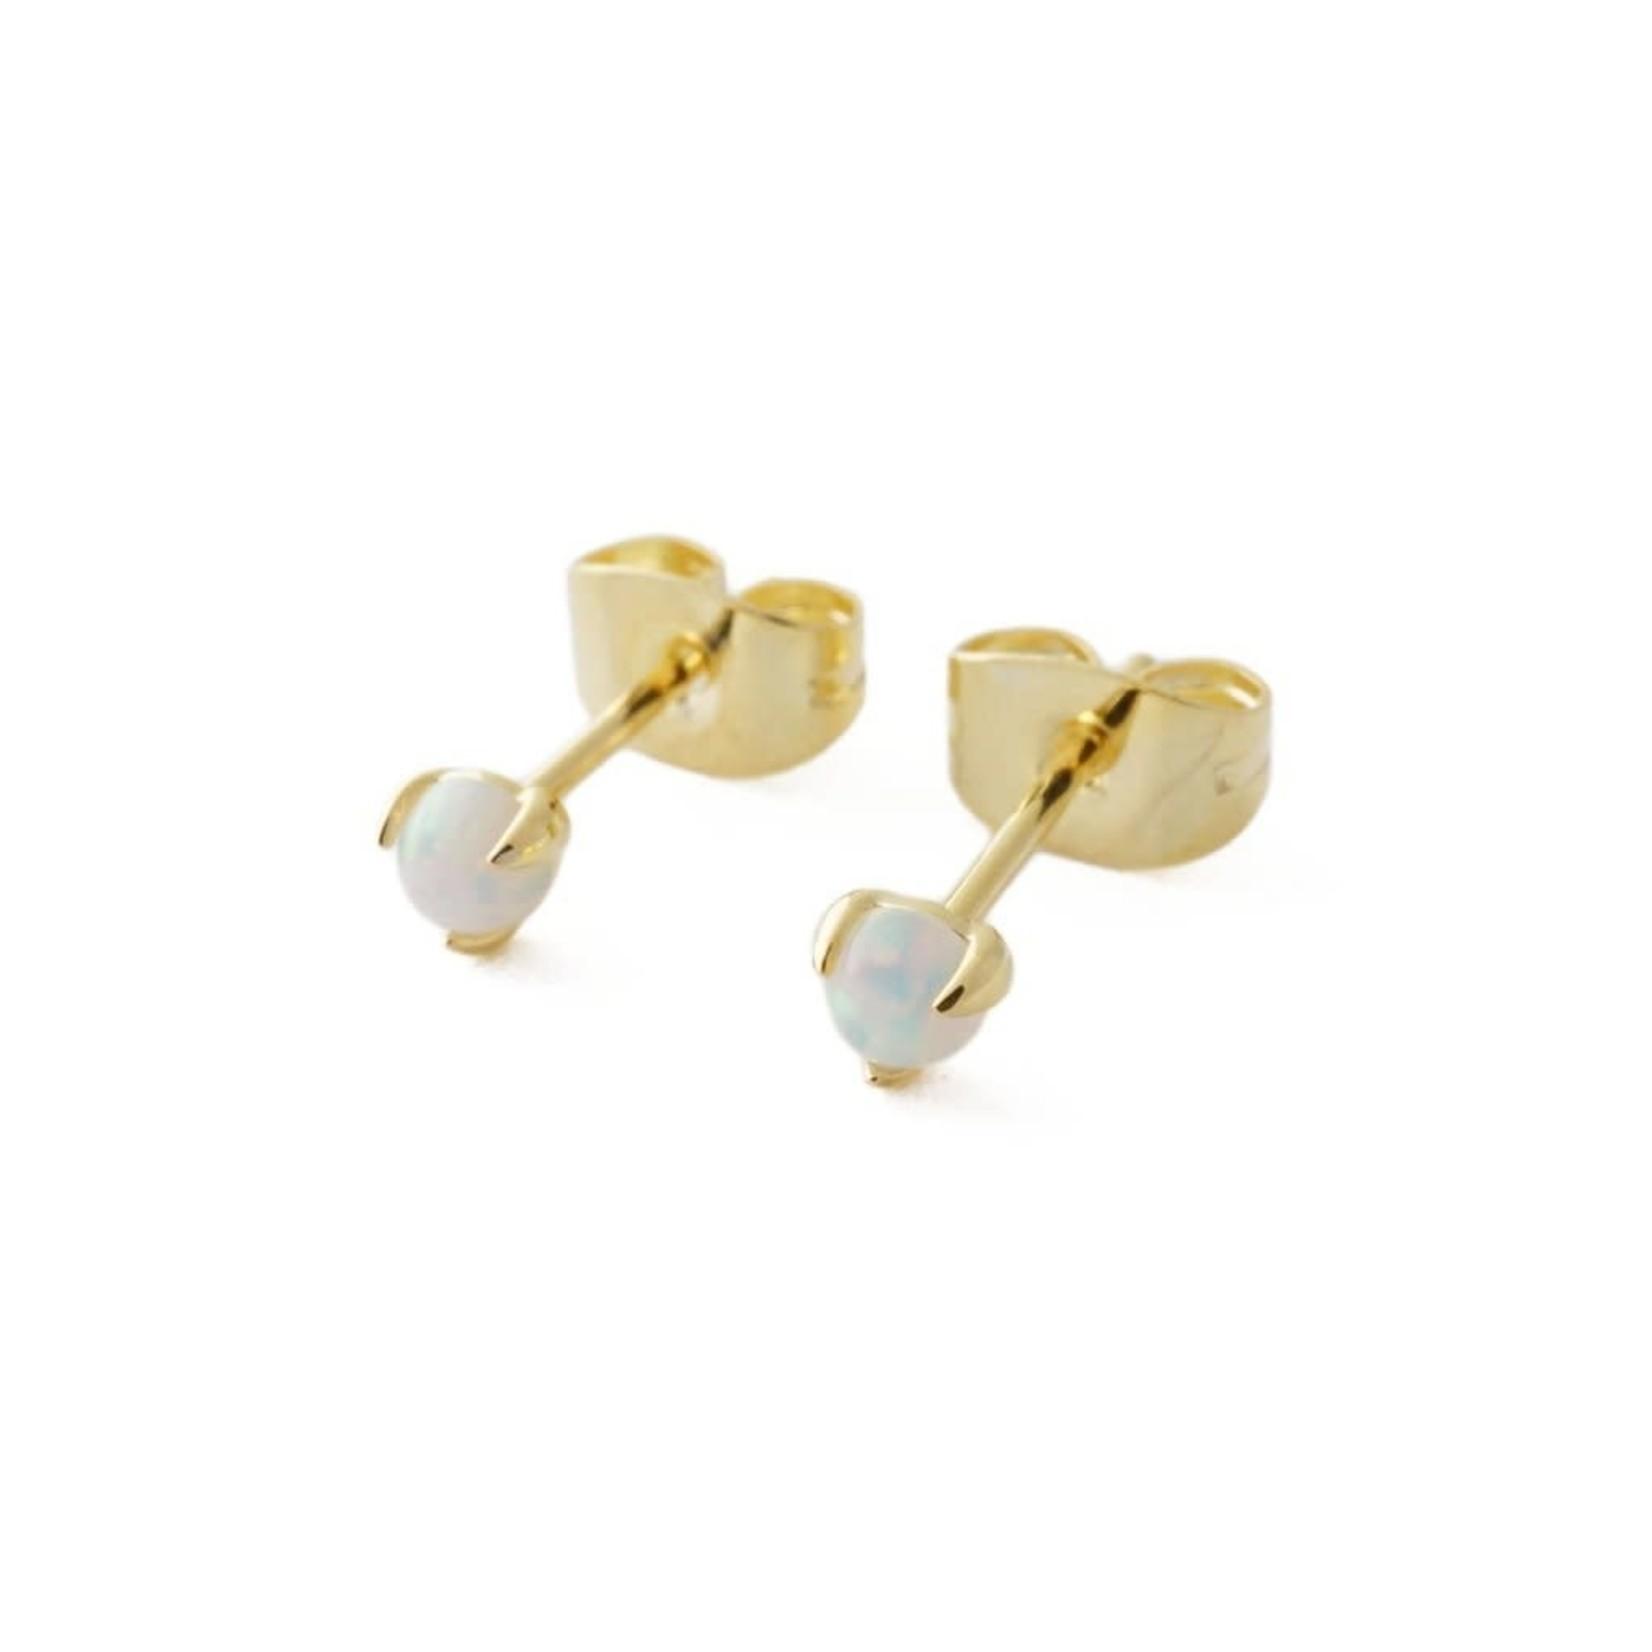 Honeycat Jewelry Honeycat Point Solitaire Studs Opal